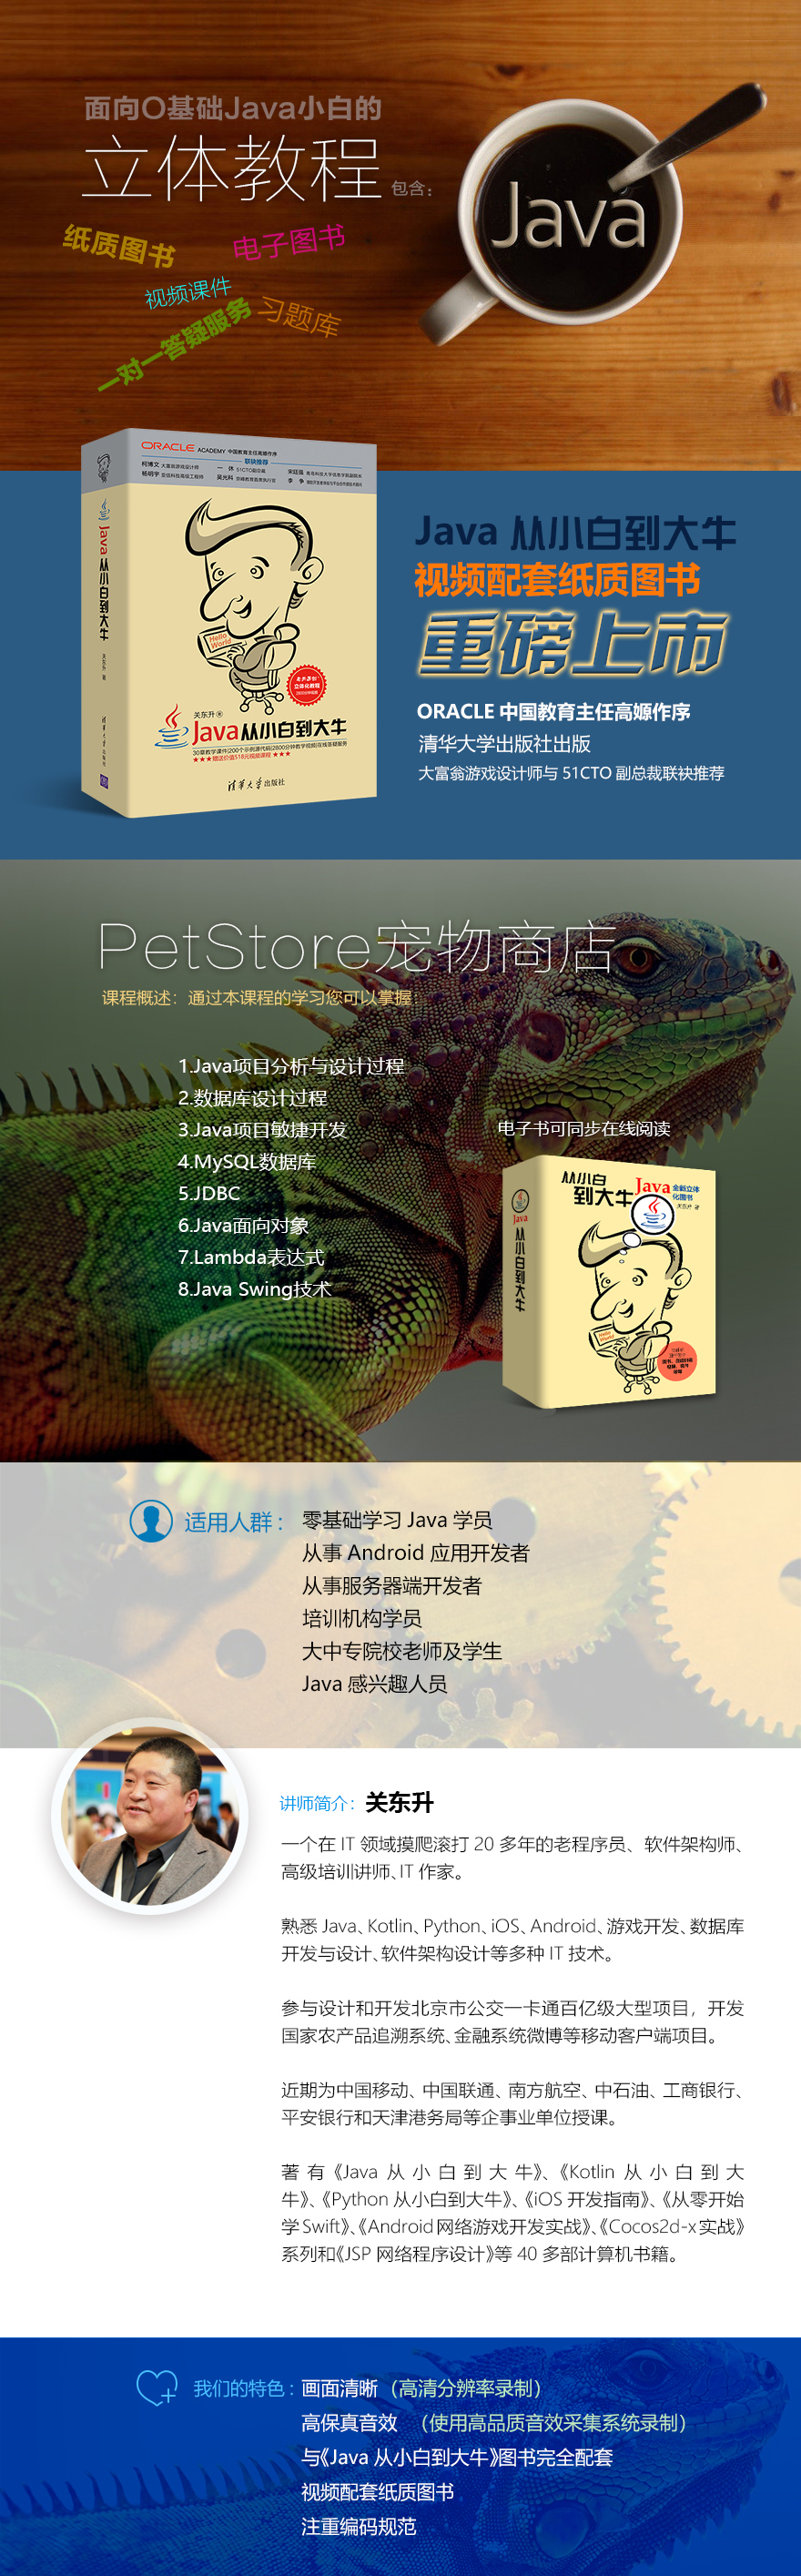 ban-宠物商店.jpg